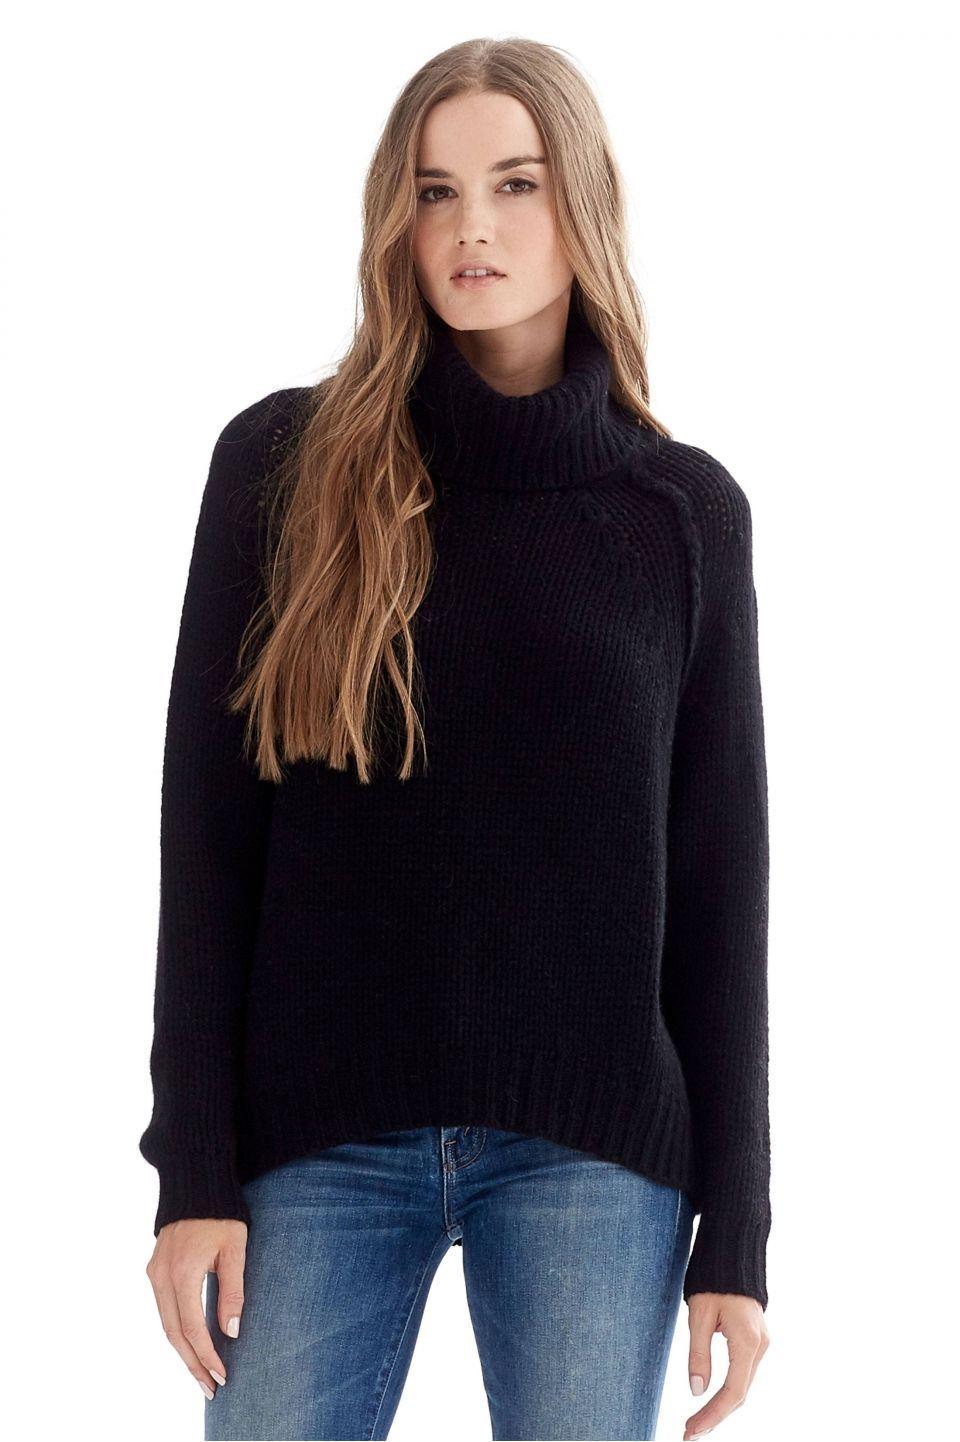 Women's Bella Black Turtleneck Sweater | Lust list | Pinterest